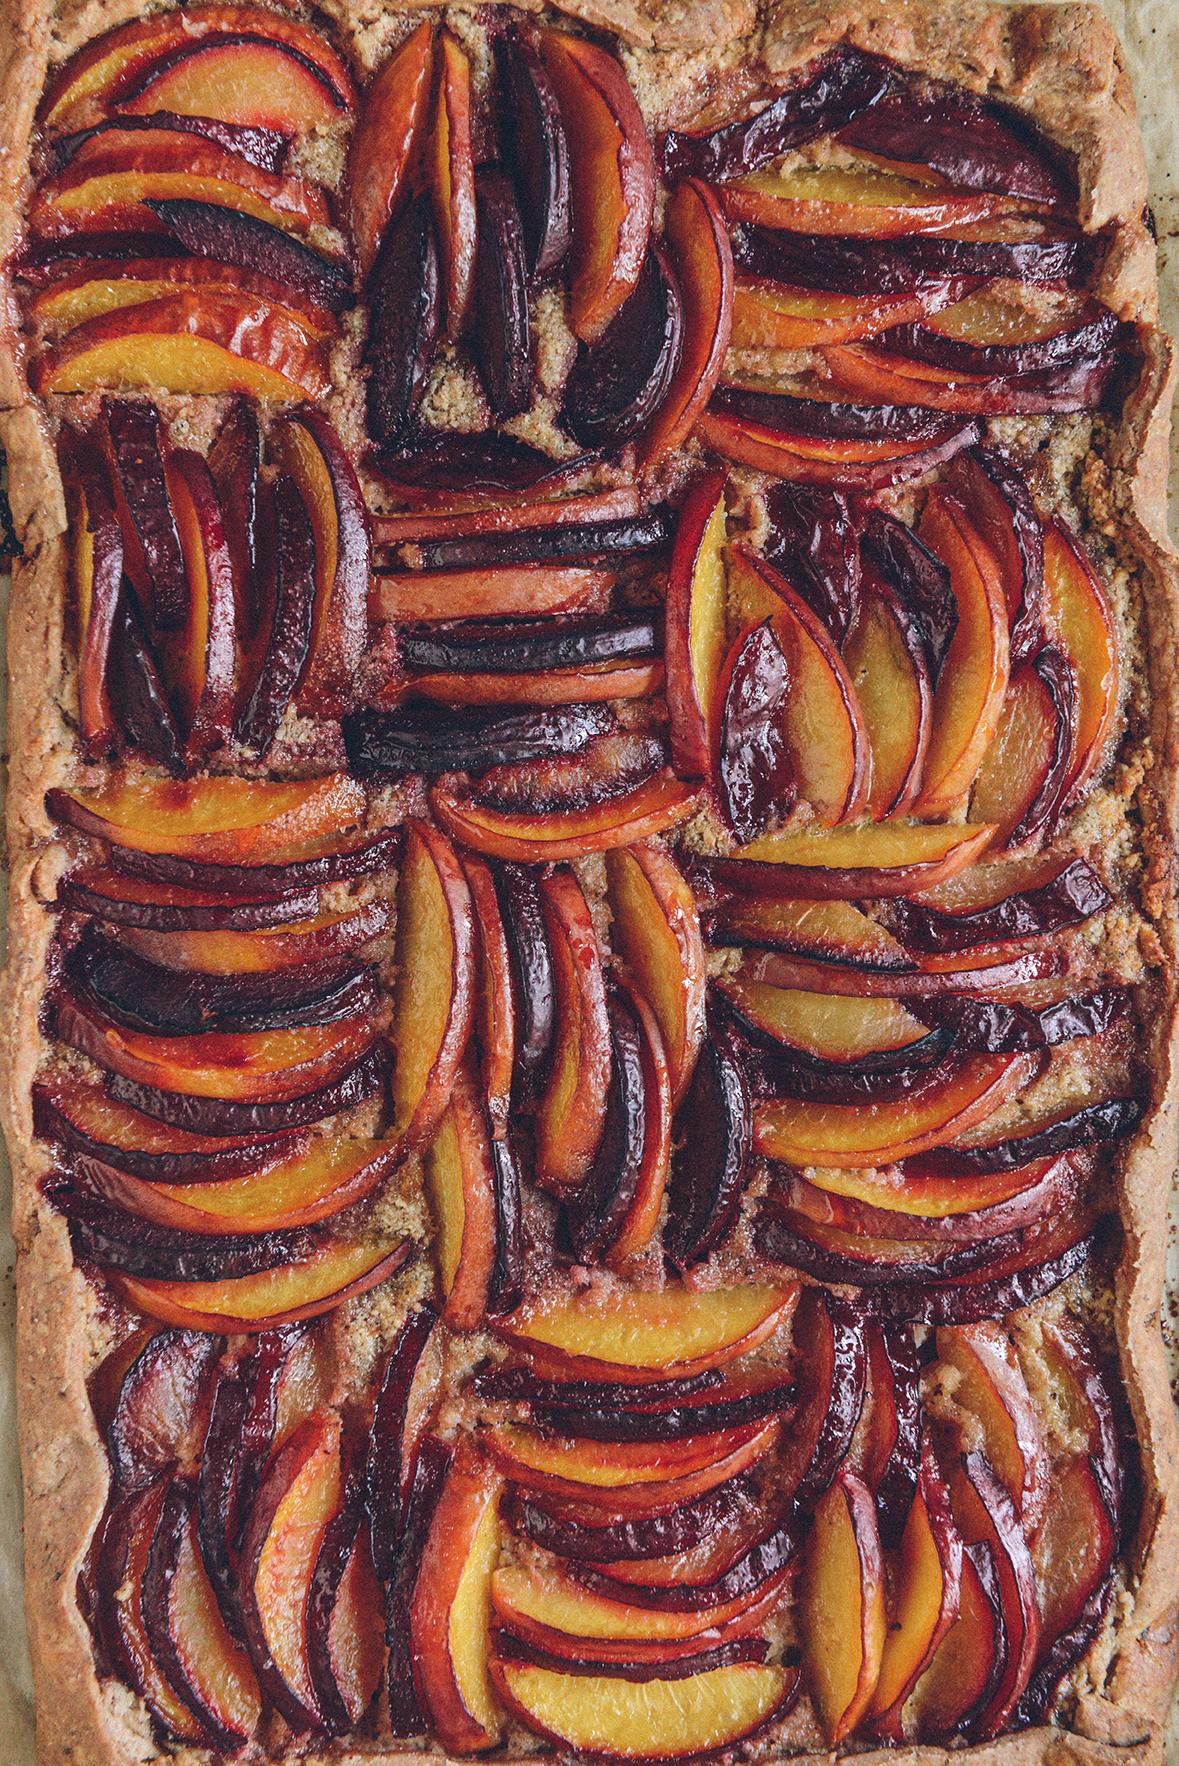 Gluten-Free Frangipane Tart with Plums & Nectarines // www.WithTheGrains.com